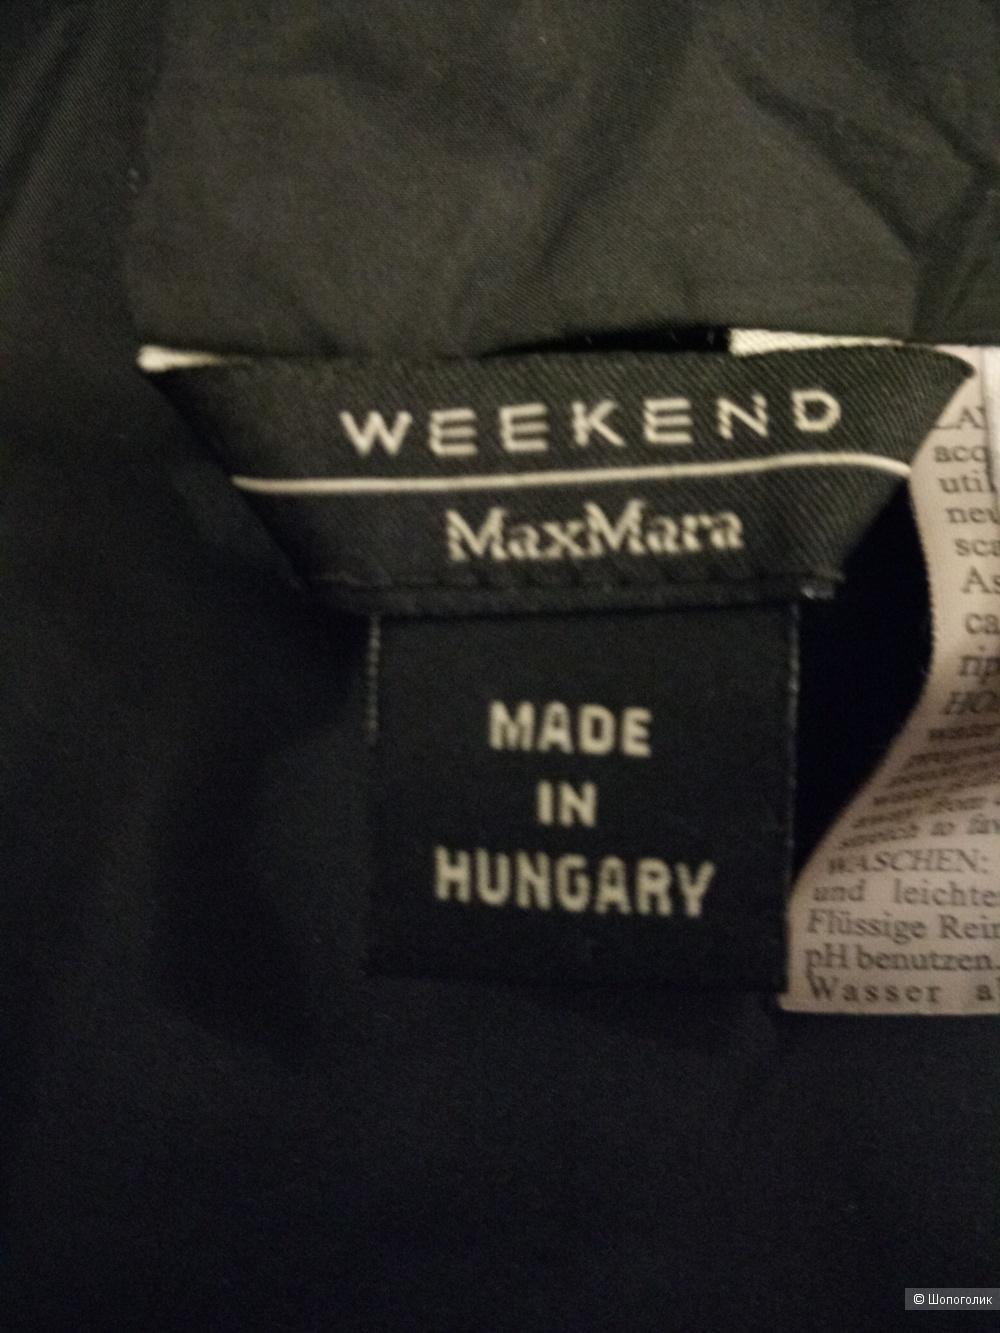 Пуховик Max Mara Weekend двусторонний, размер 44-46 рос.